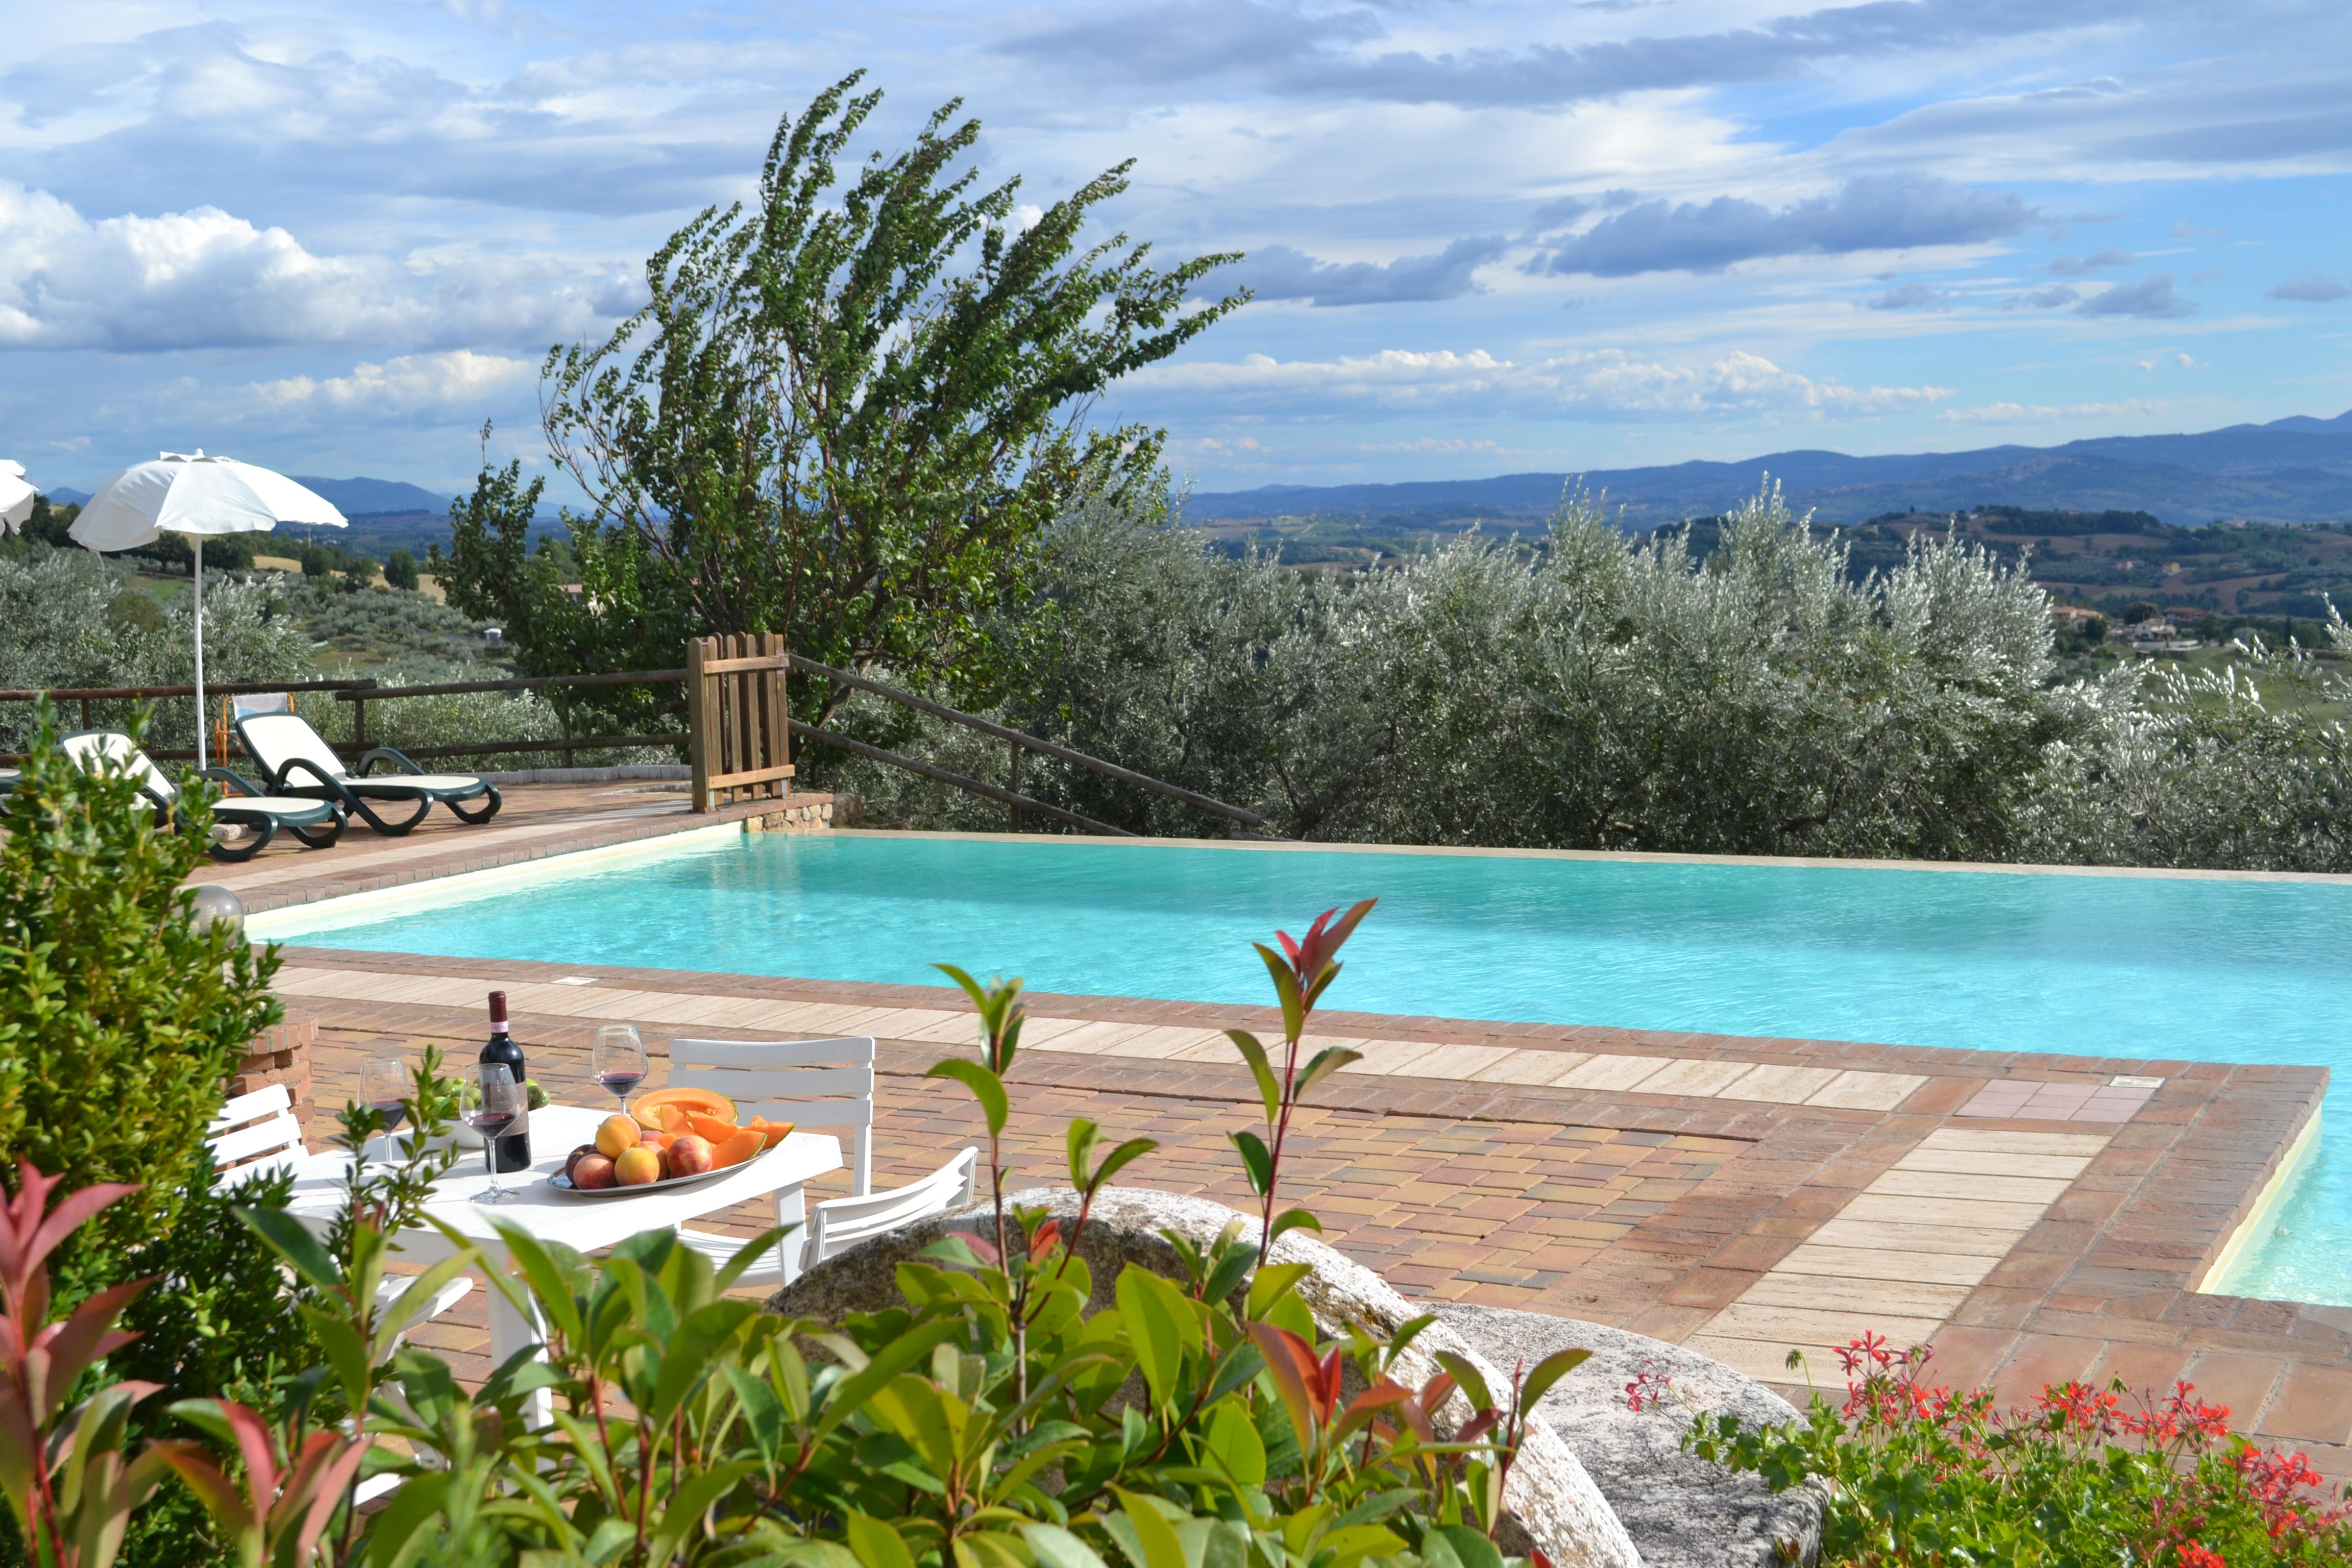 Agriturismo con piscina a cascata in umbria umbria bimbo - Agriturismo con piscina ...